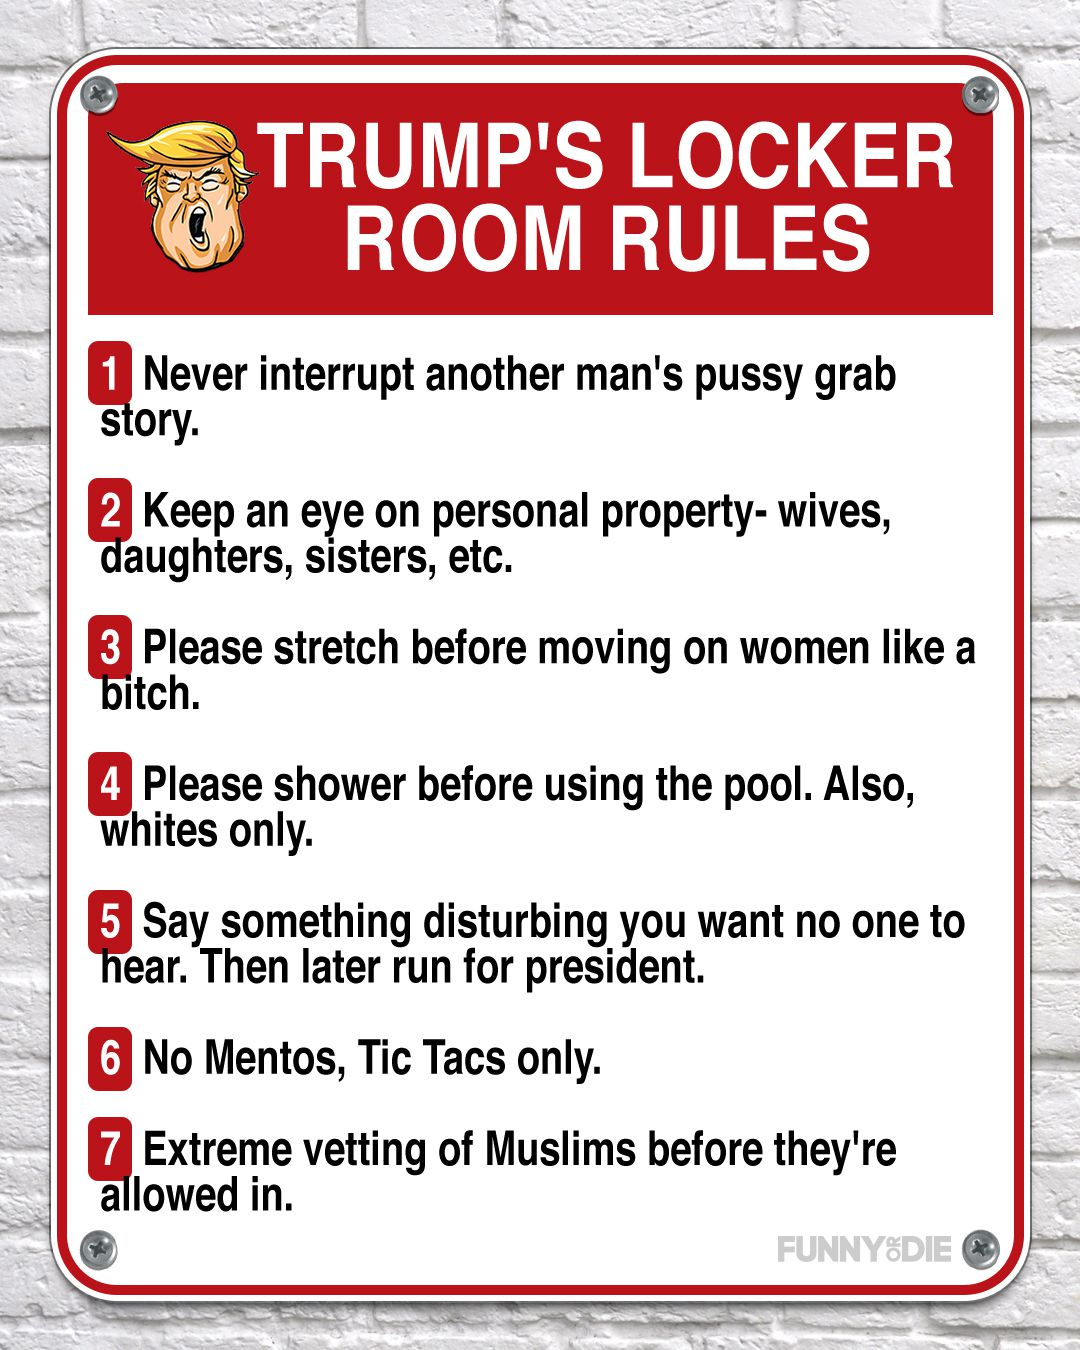 Rules Of Donald Trump's Locker Room - Funny Or Die